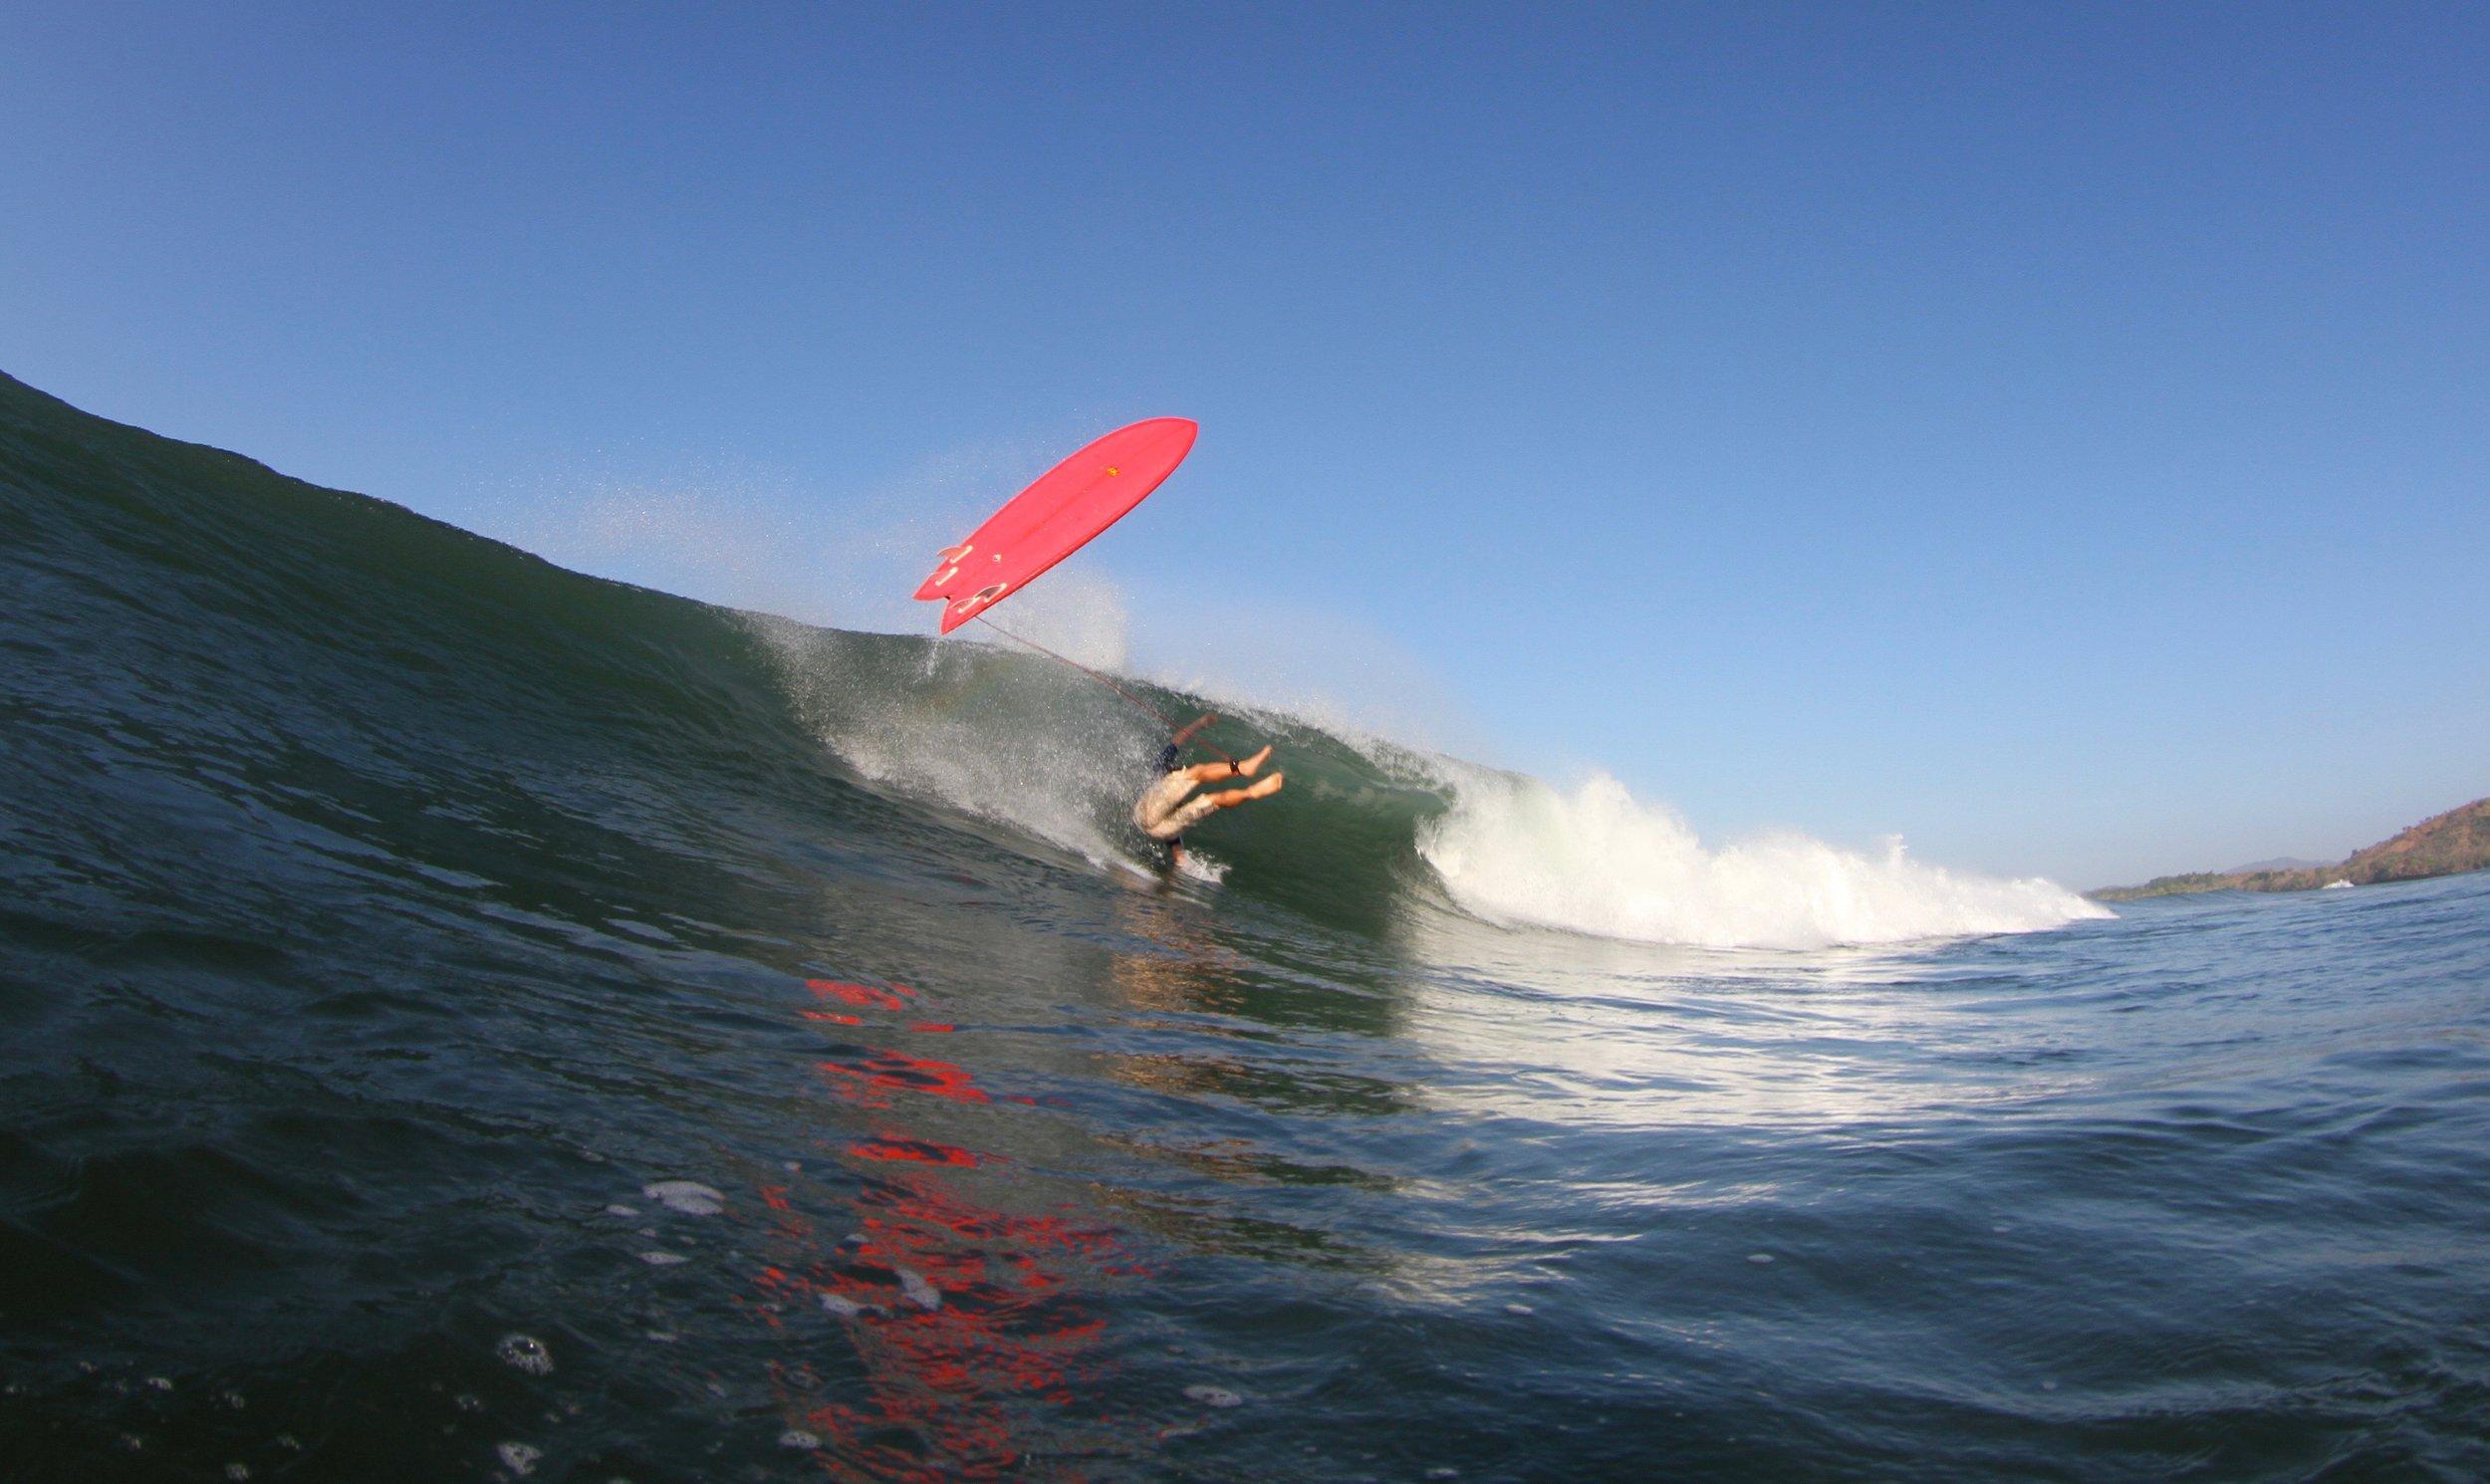 Surf Wipe Out Santa Catalina